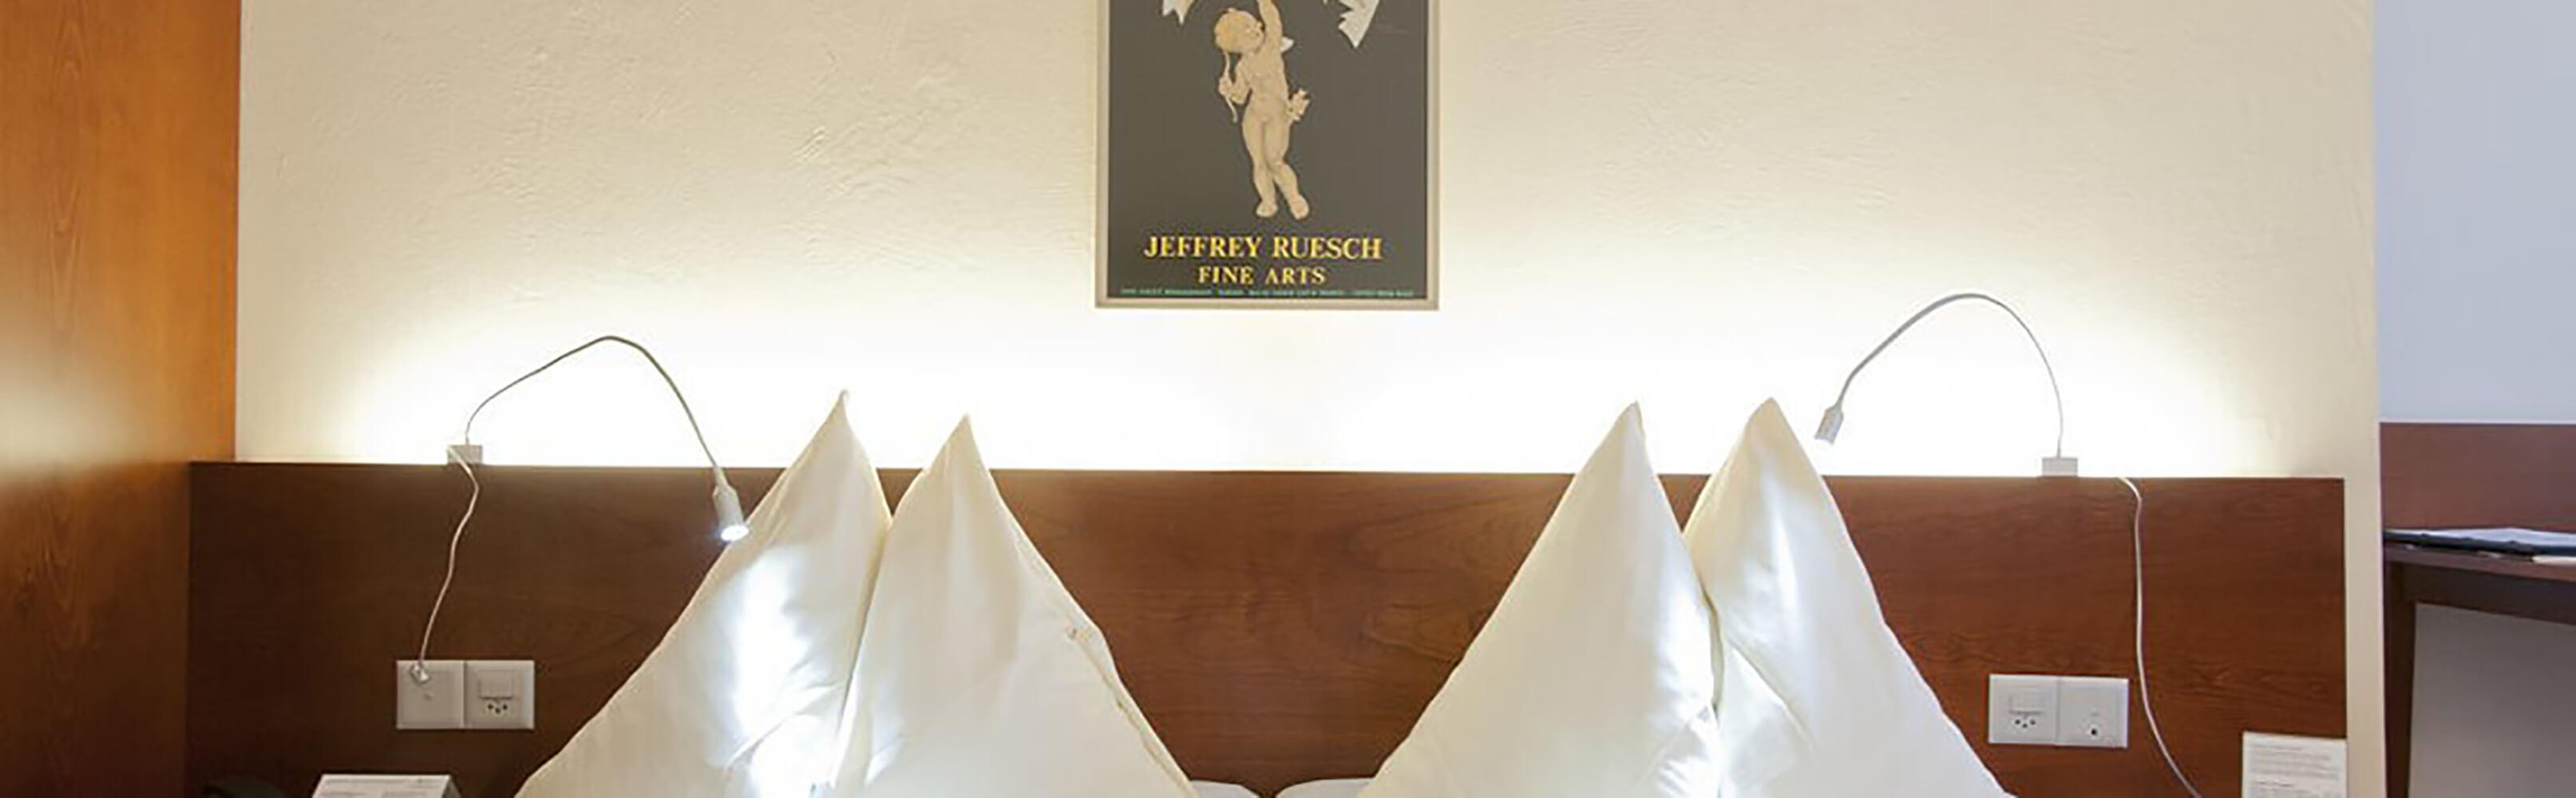 Hotel Restaurant Goldener Schlüssel Bern  1